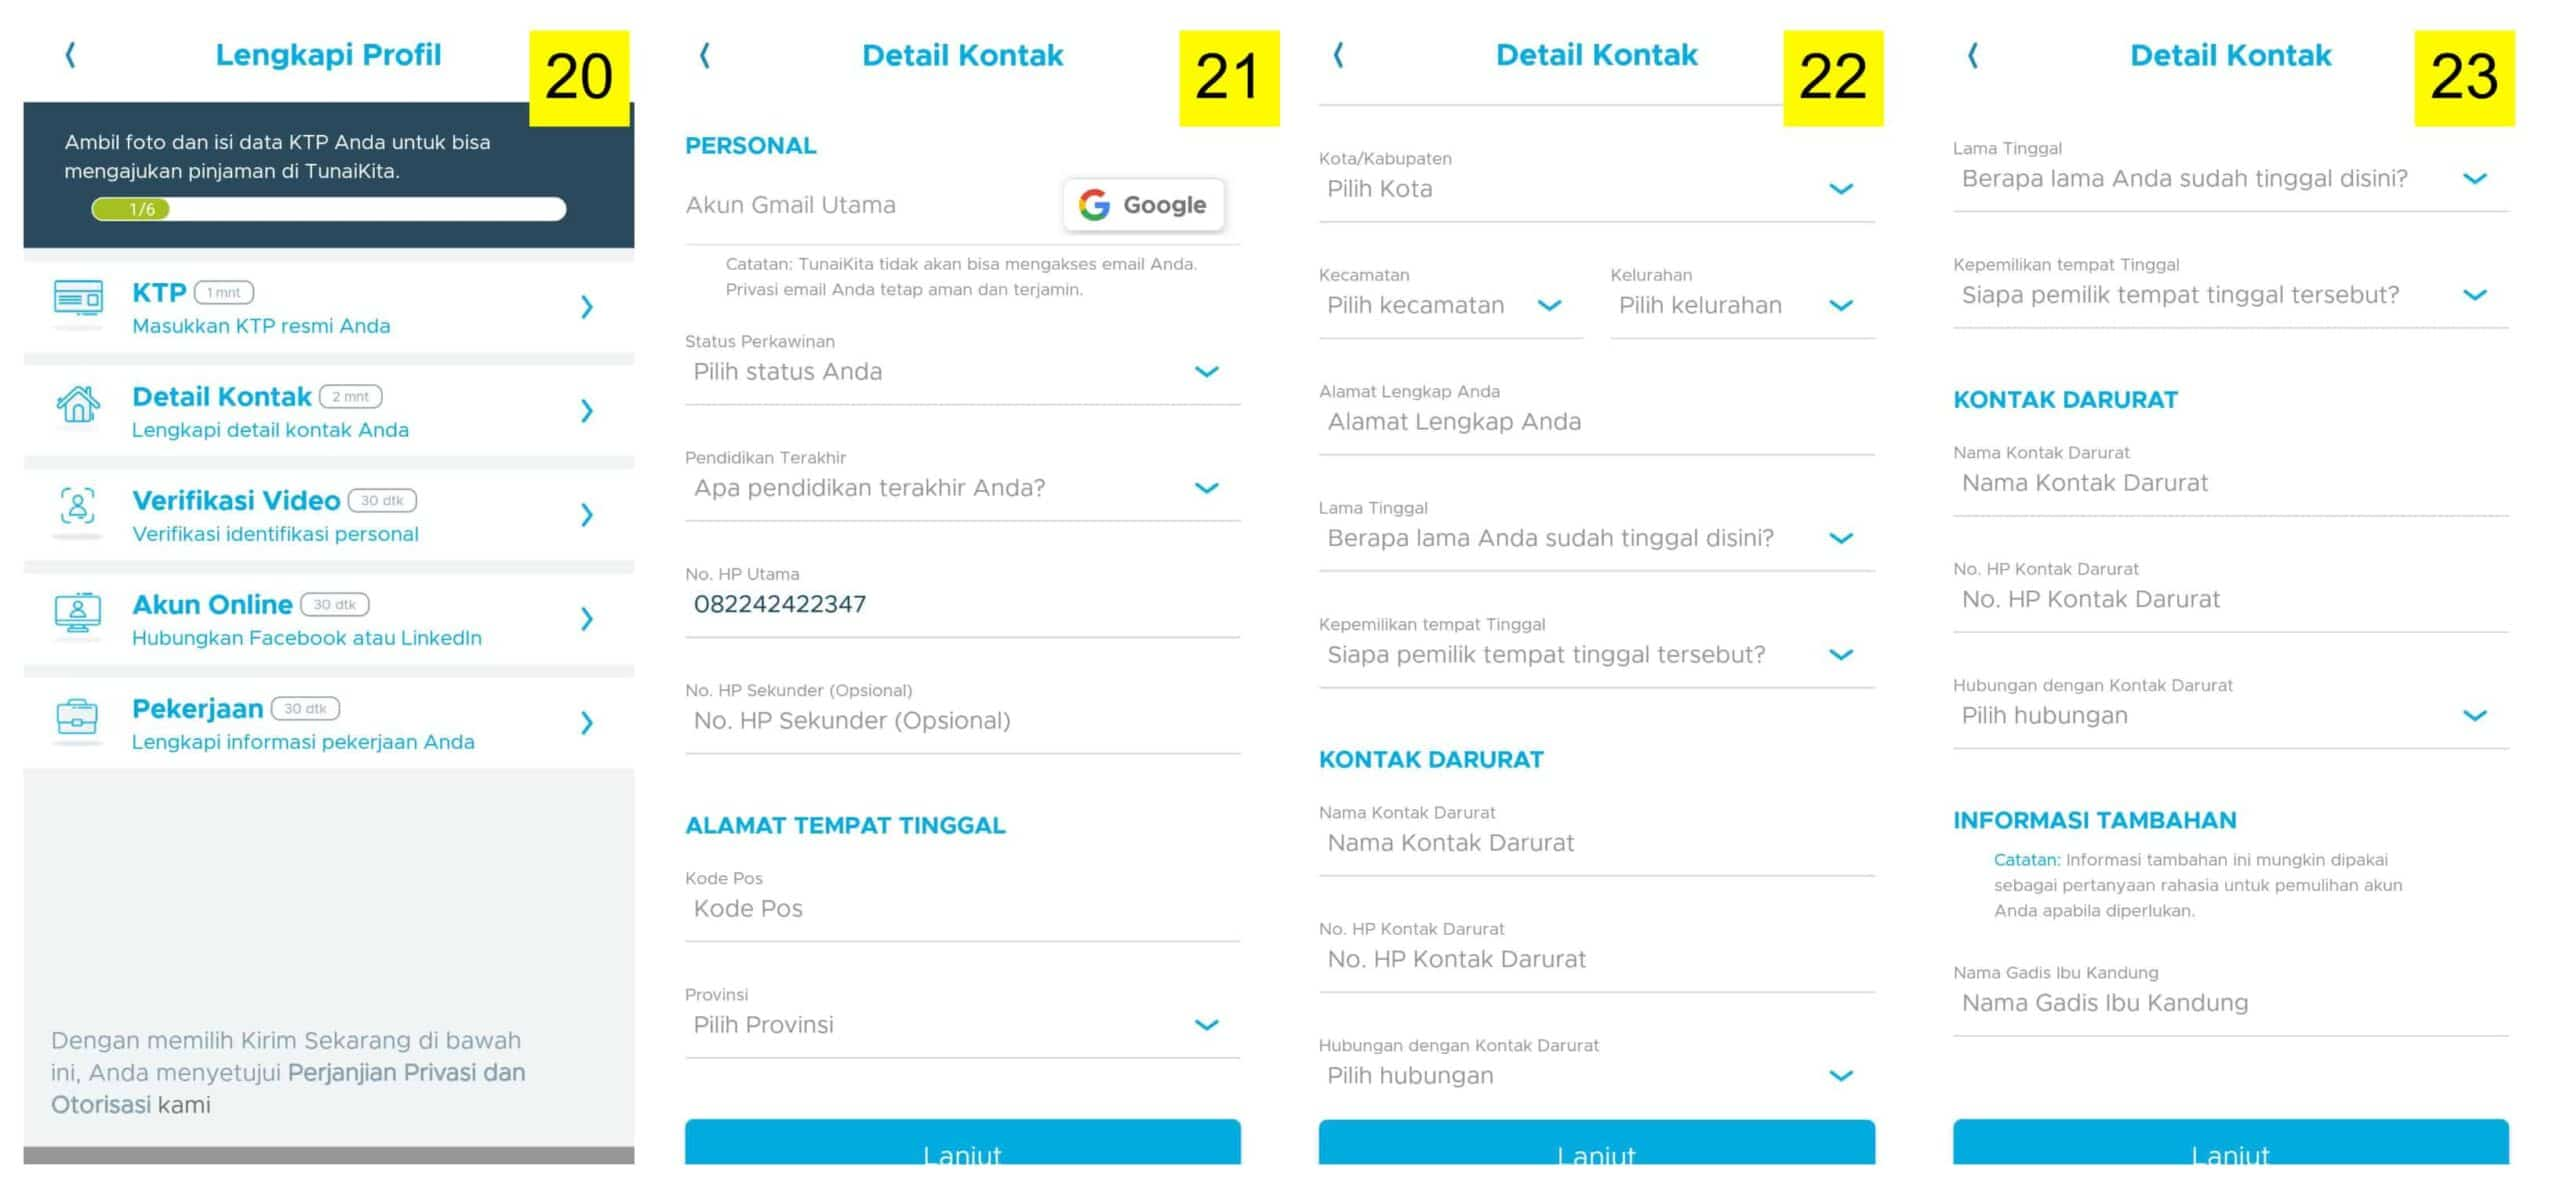 Pengisian Data Pribadi di Aplikasi Pinjaman Tunai Online